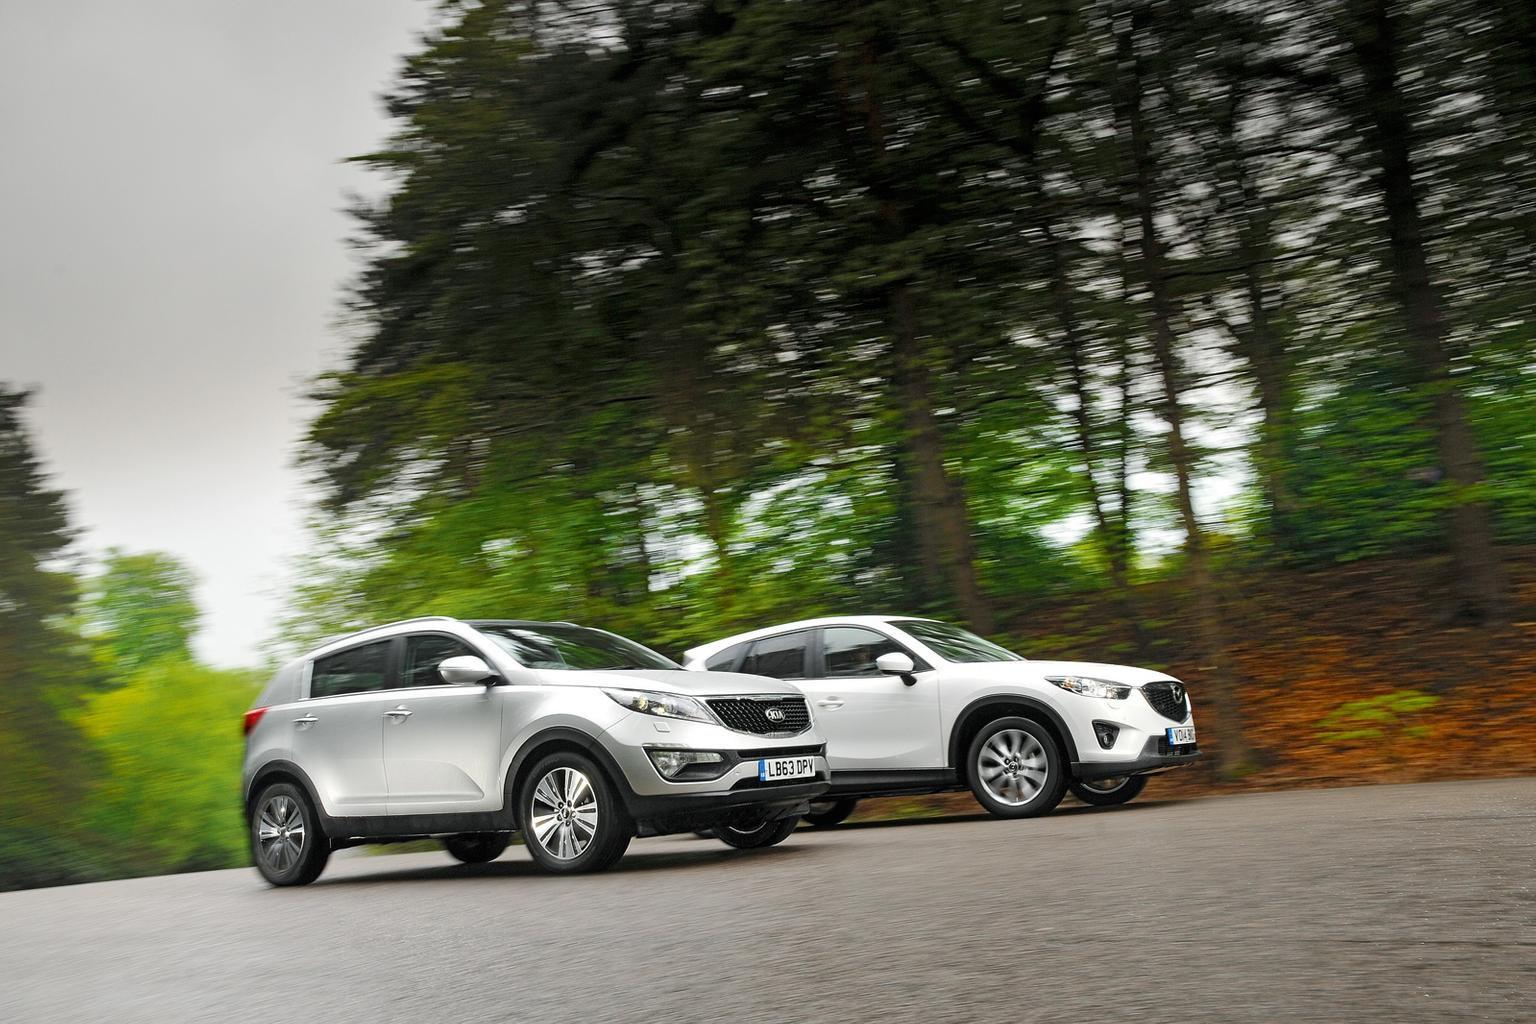 Kia Sportage vs Mazda CX-5